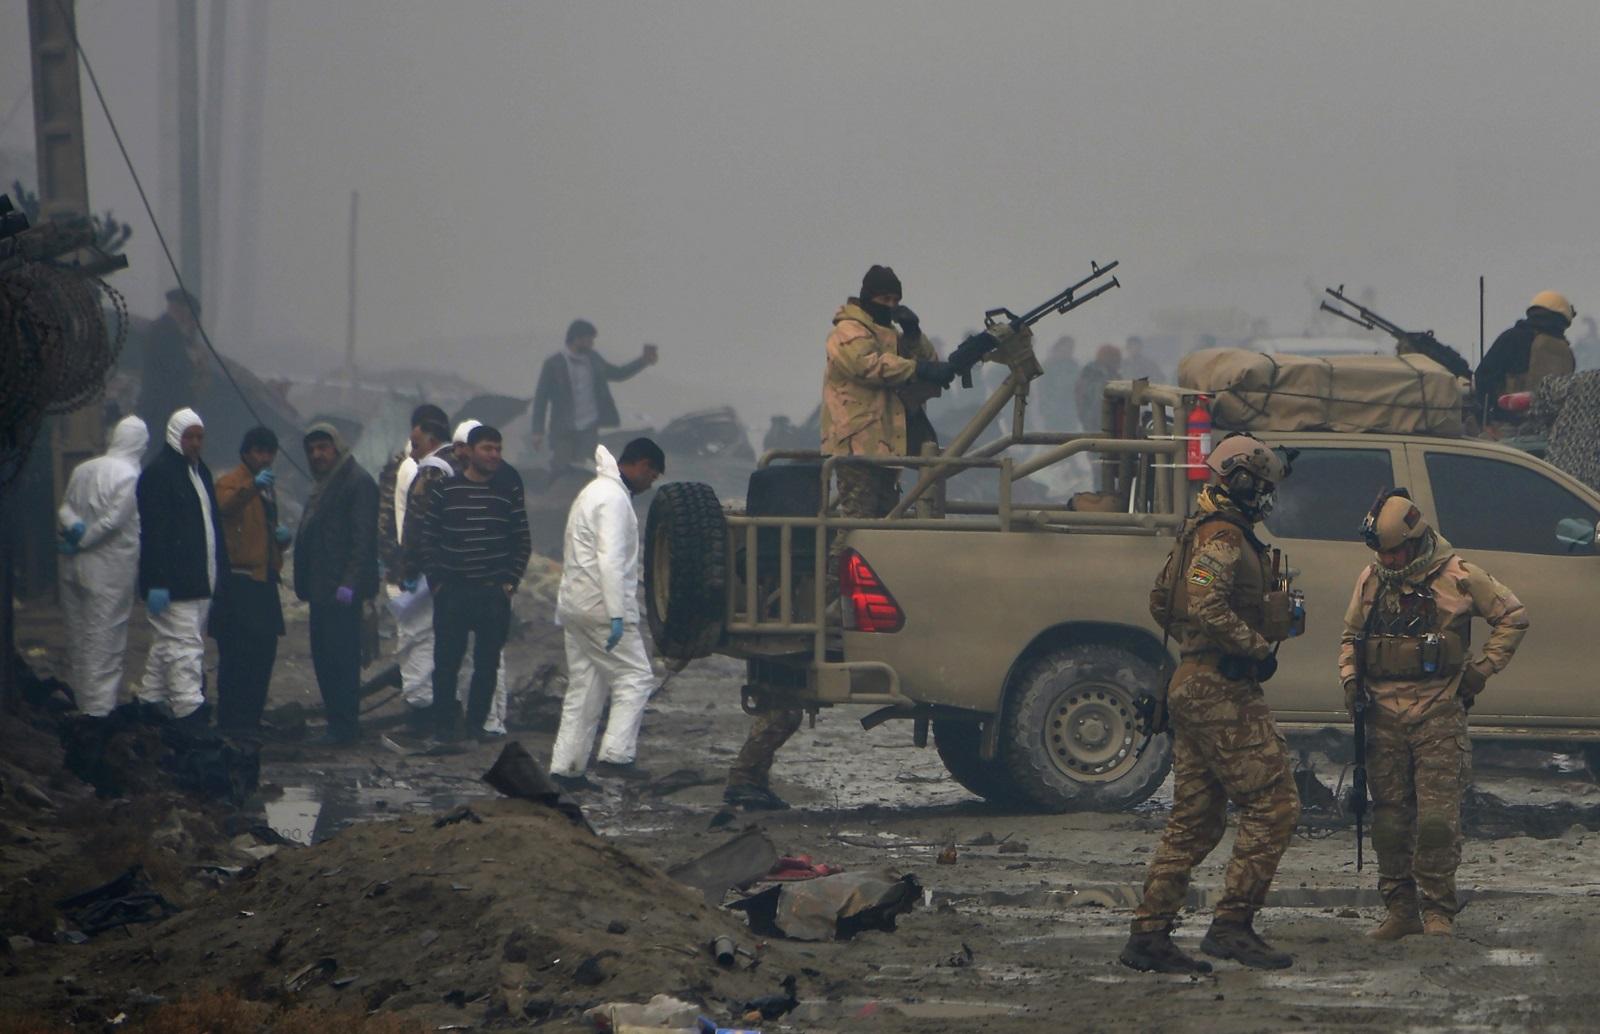 Escort girls in Kabul